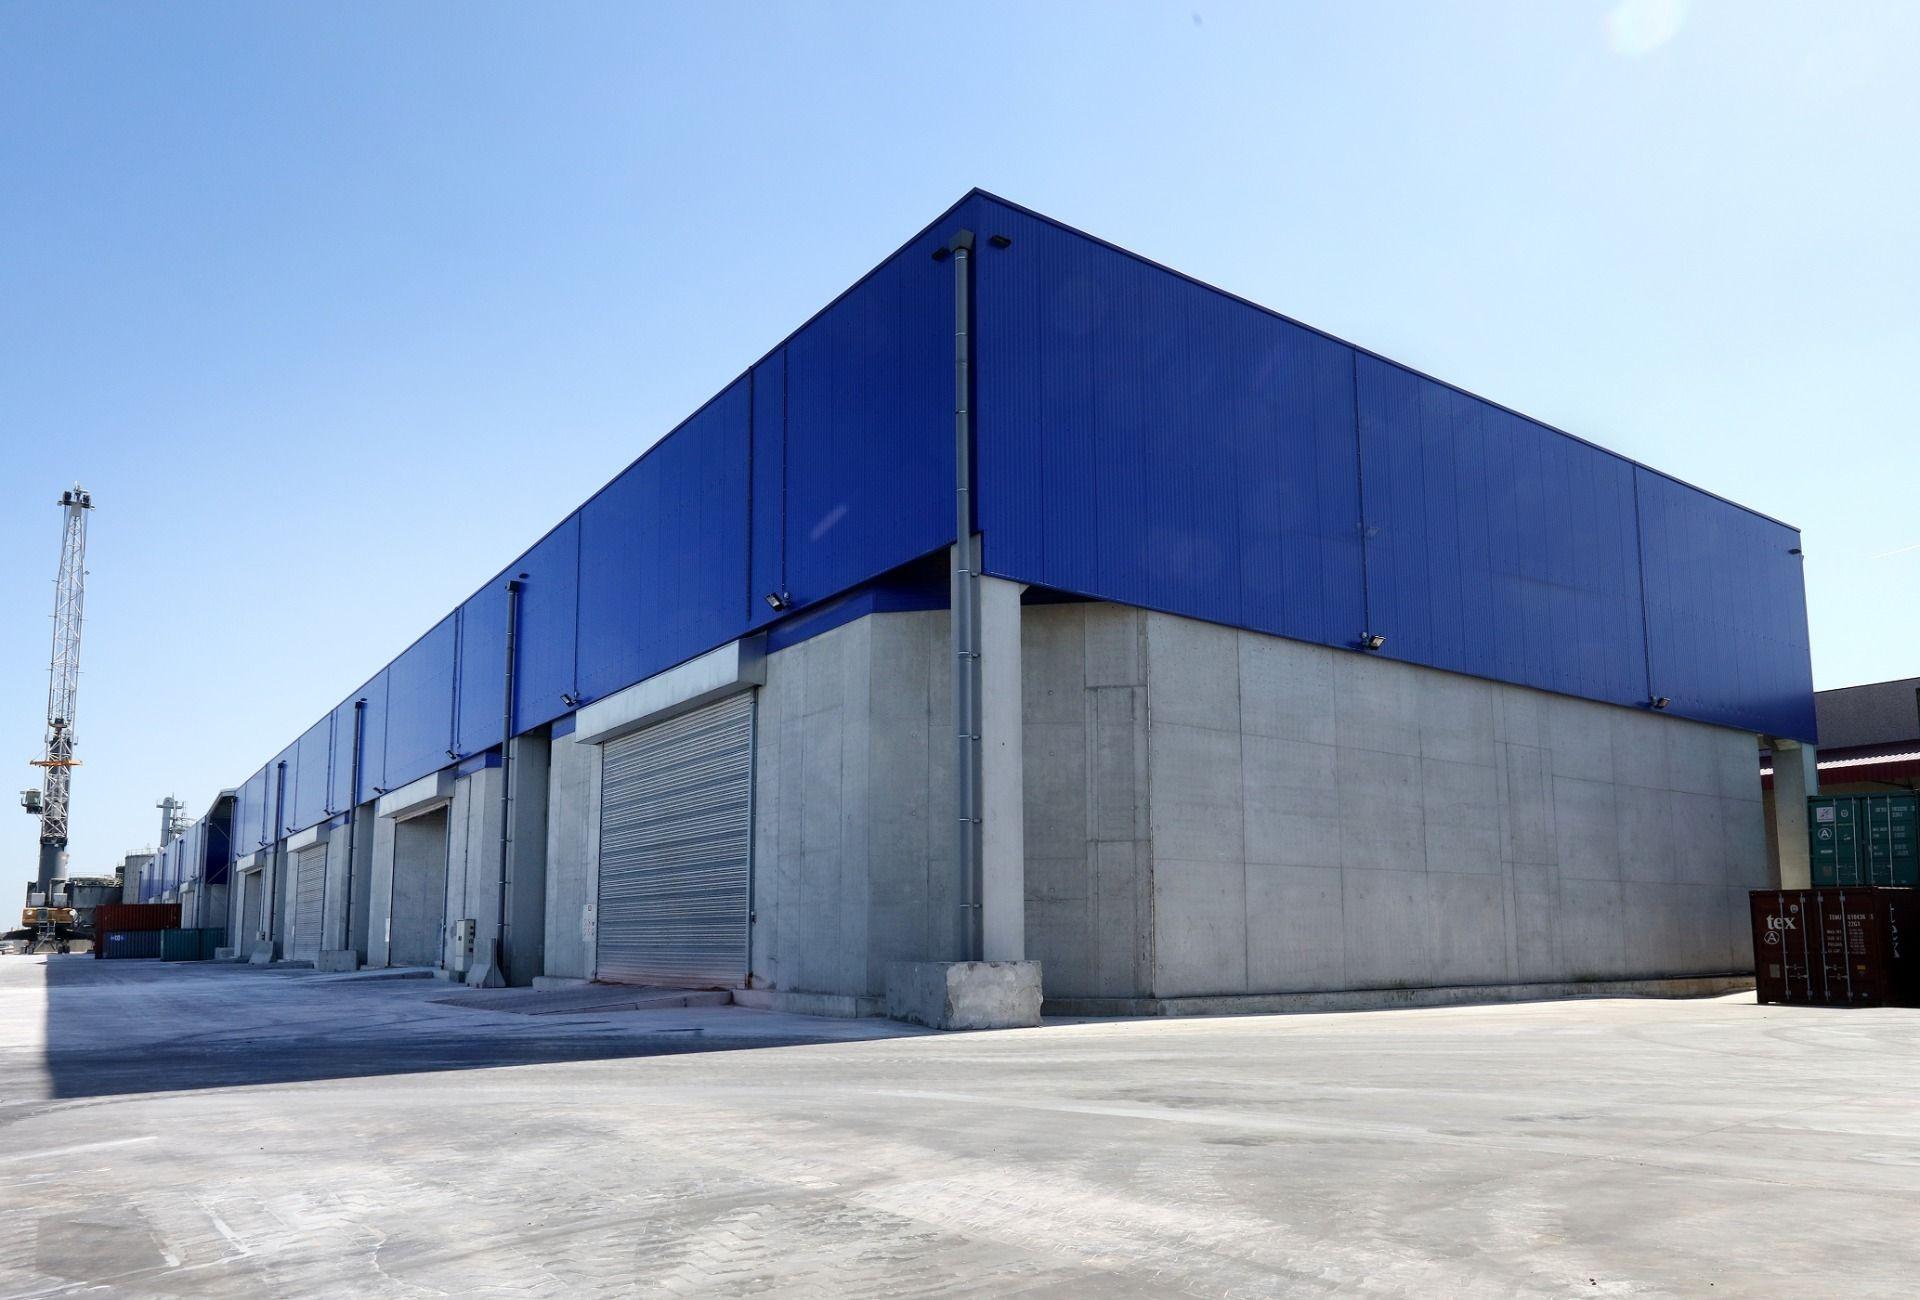 Construction local industriel 5dehavendok antwerpen haven16